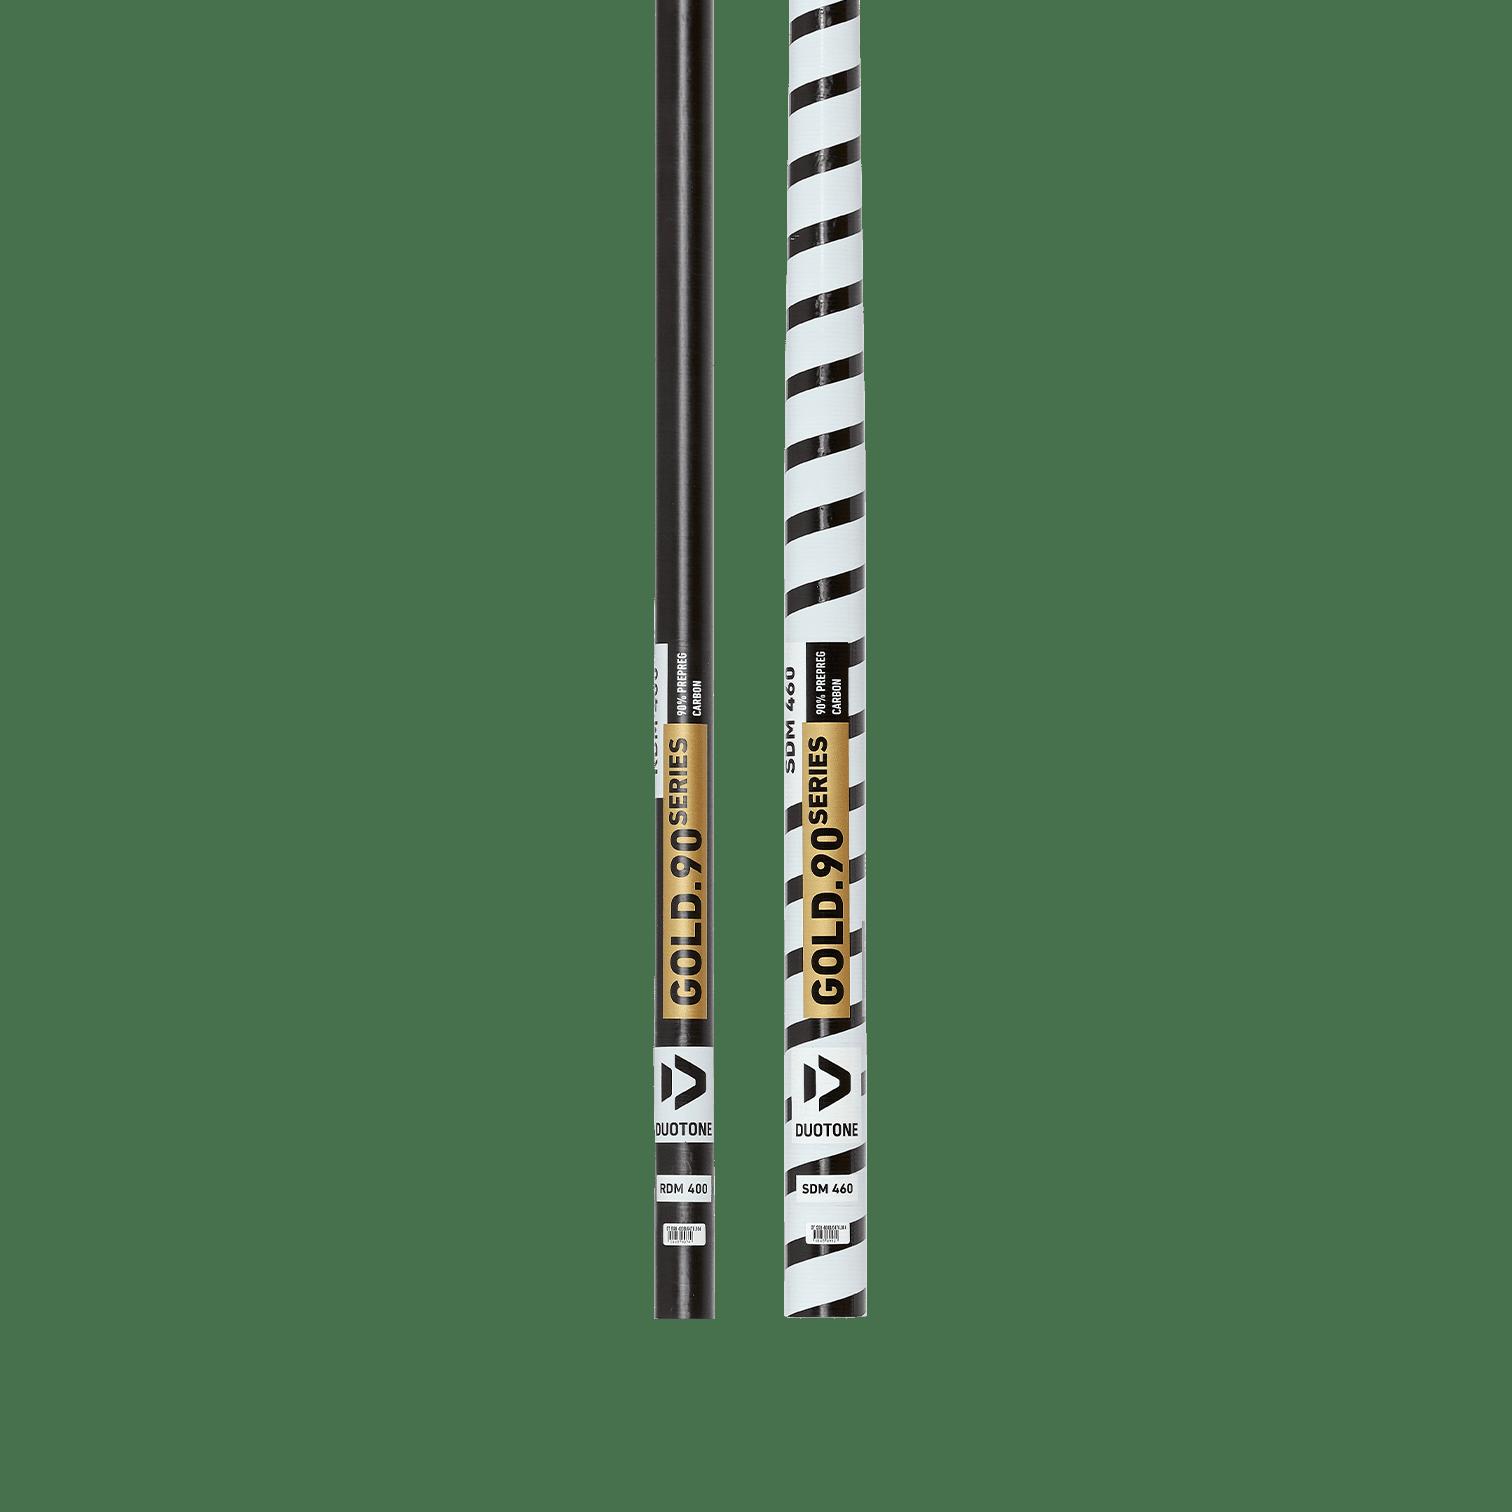 Duotone Gold 90% RDM Mast